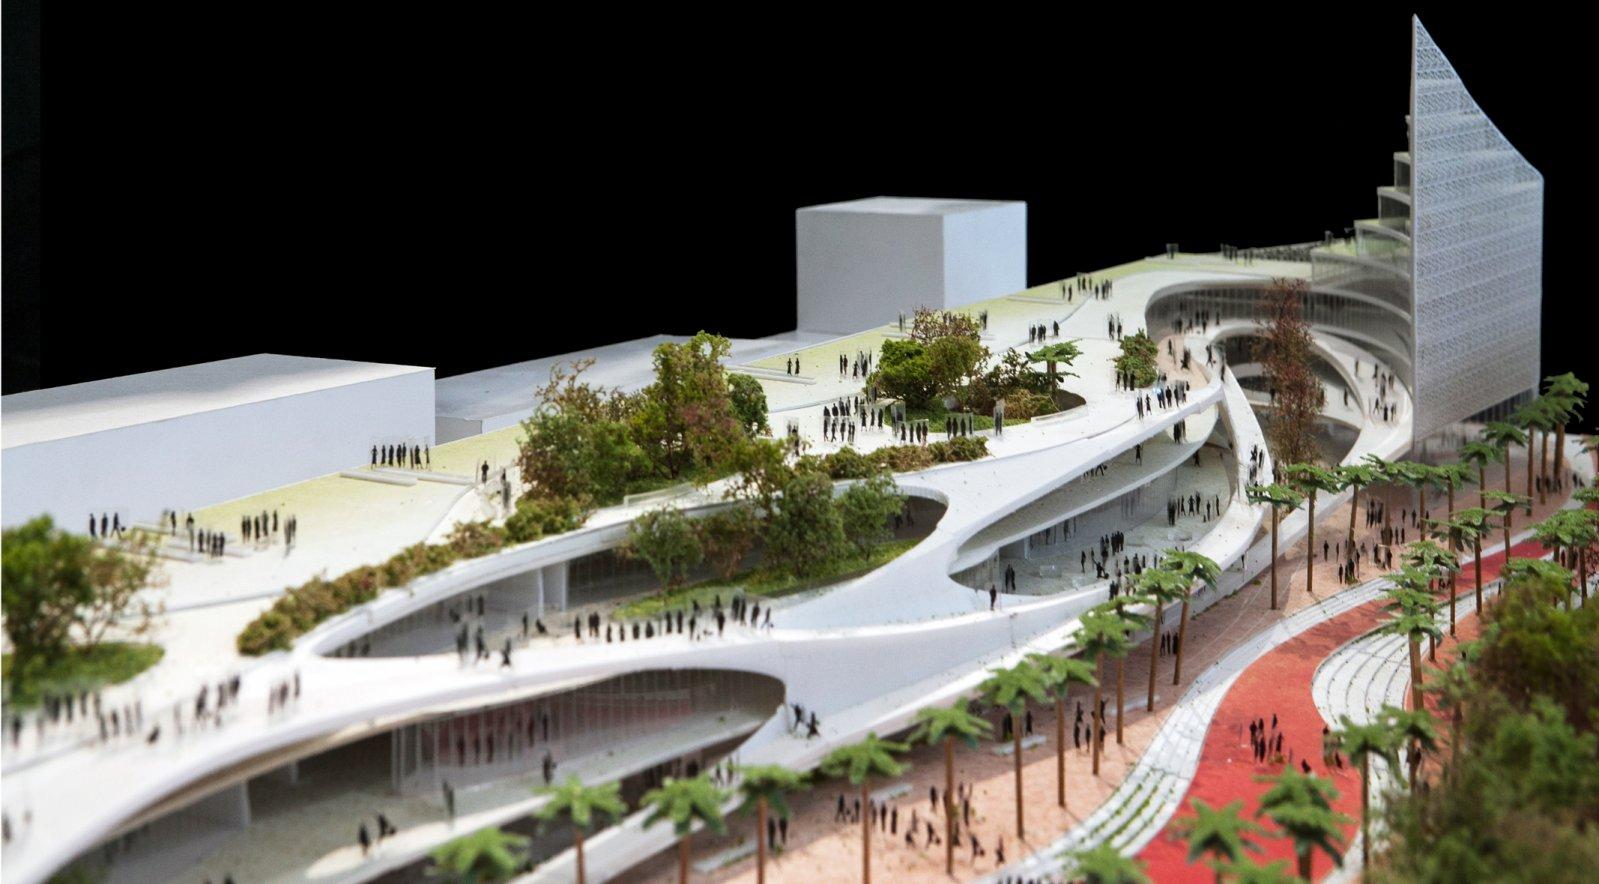 Masterplan for the rehabilitation of the San Berillo by Mario Cucinella Architects